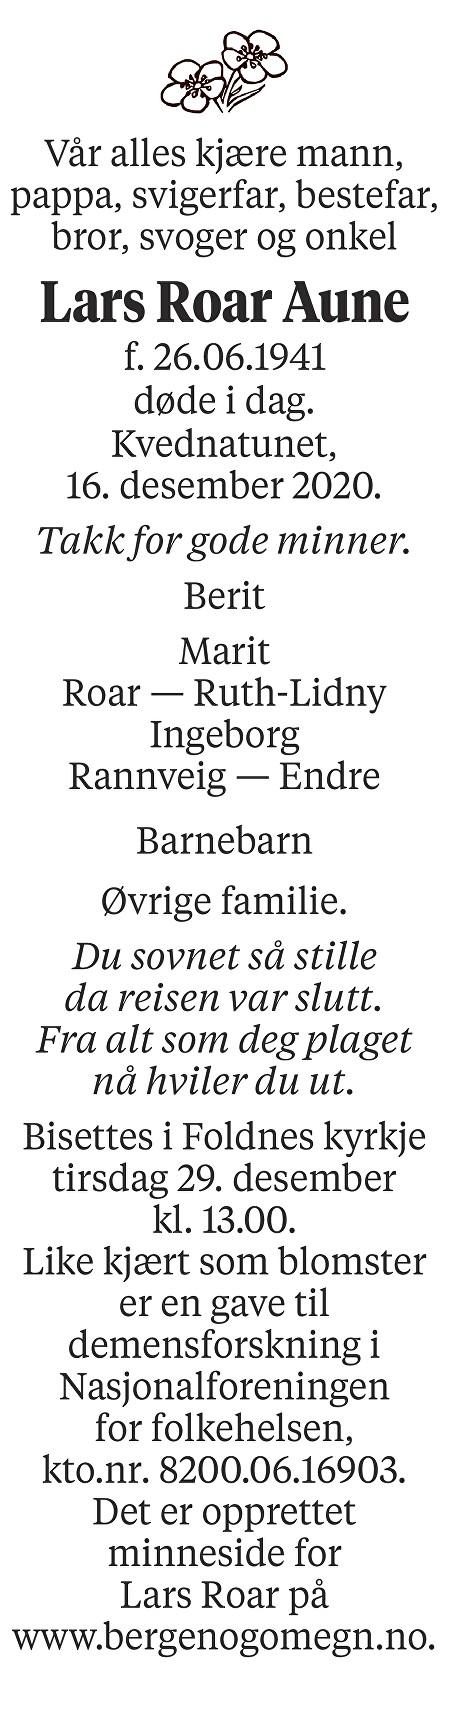 Lars Roar Aune Dødsannonse